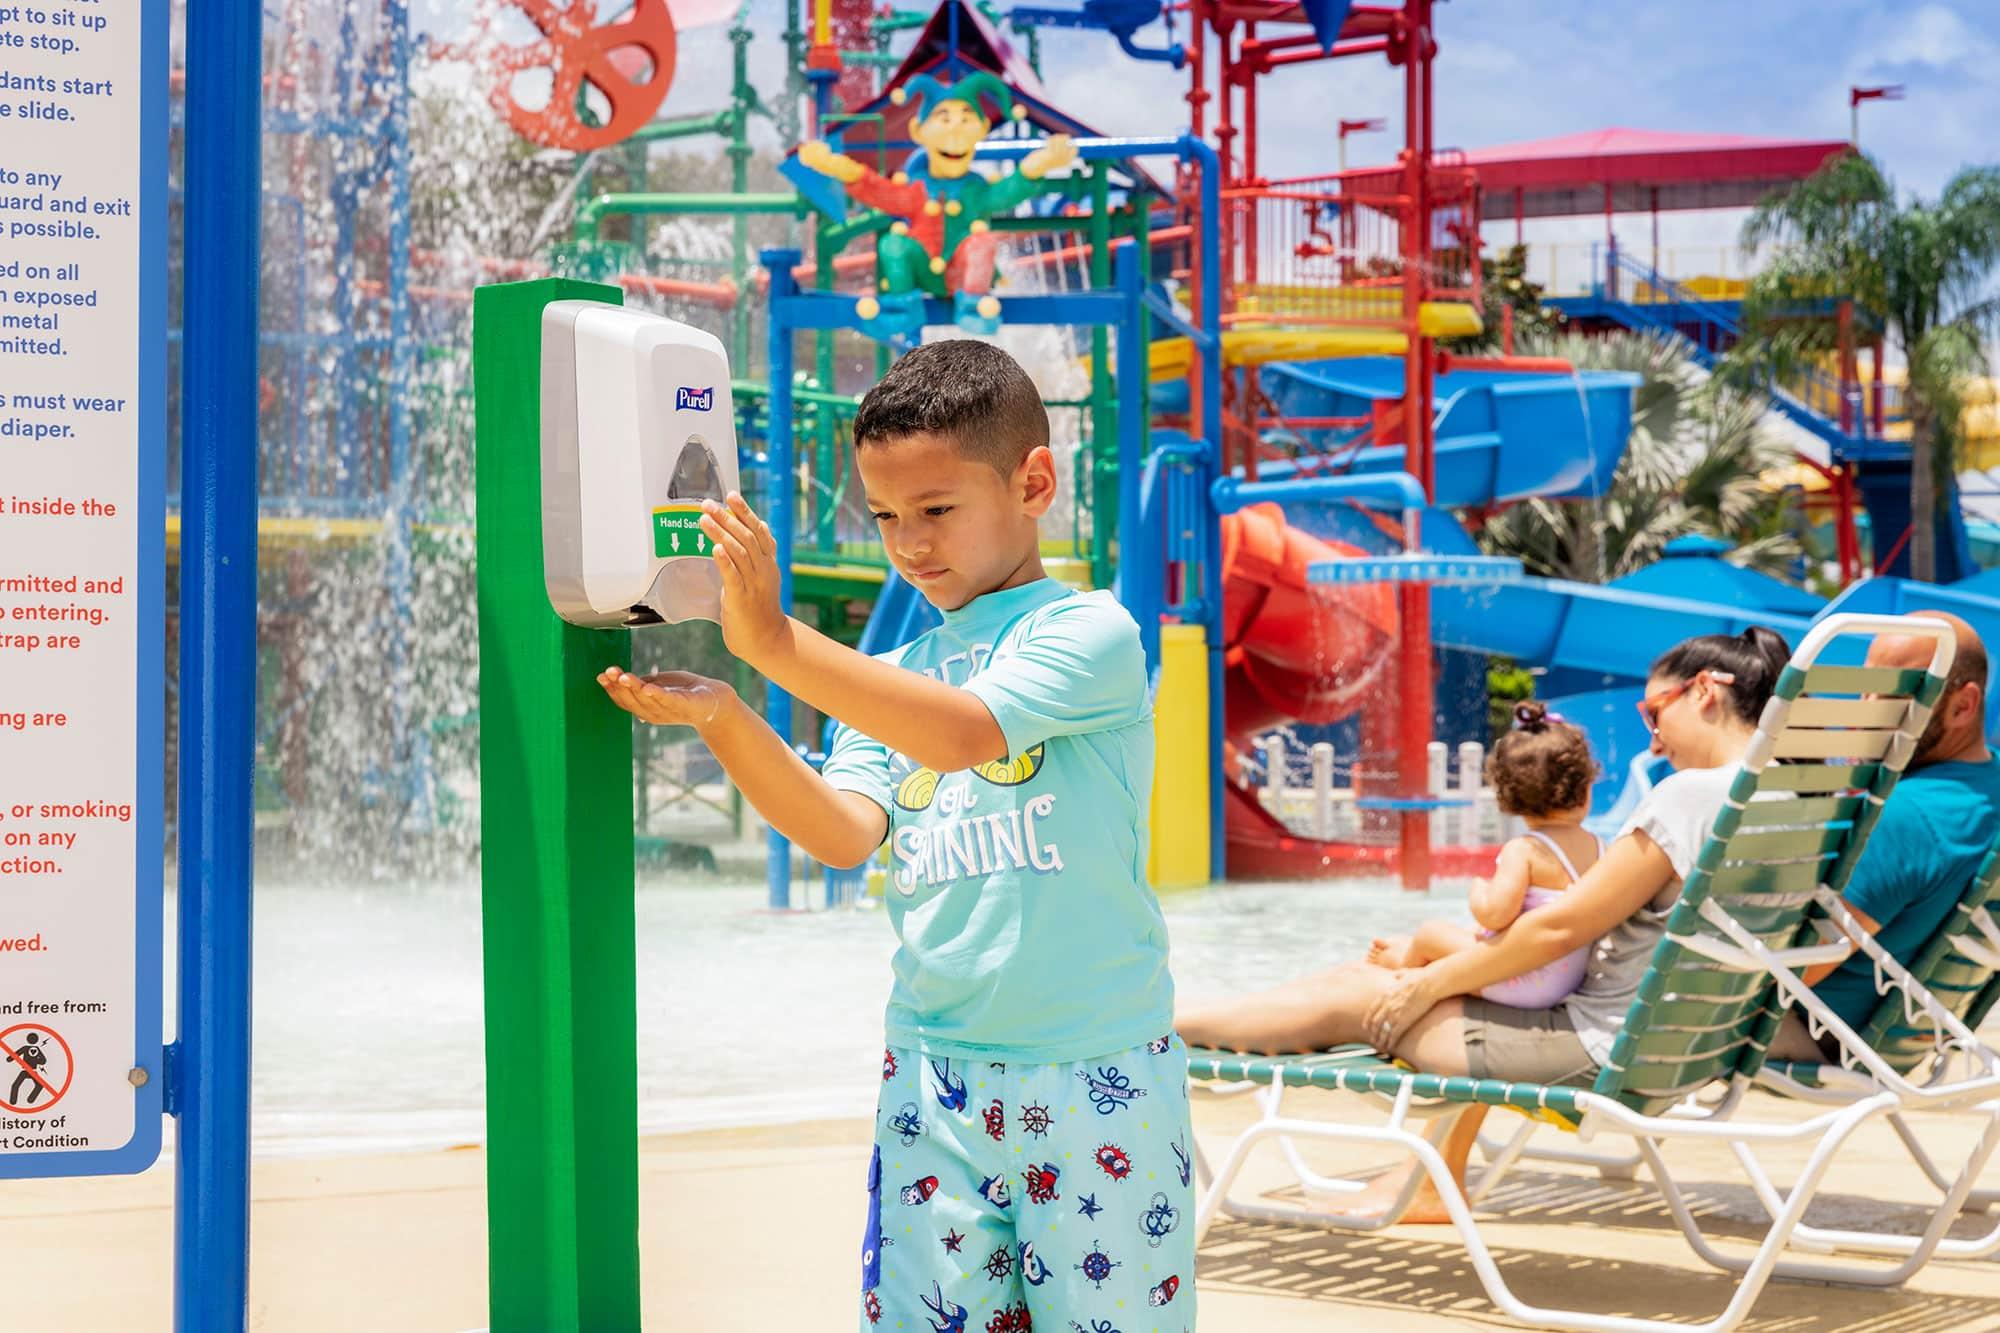 Child using hand Sanitizer station at LEGOLAND Water Park in Winter Haven, FL